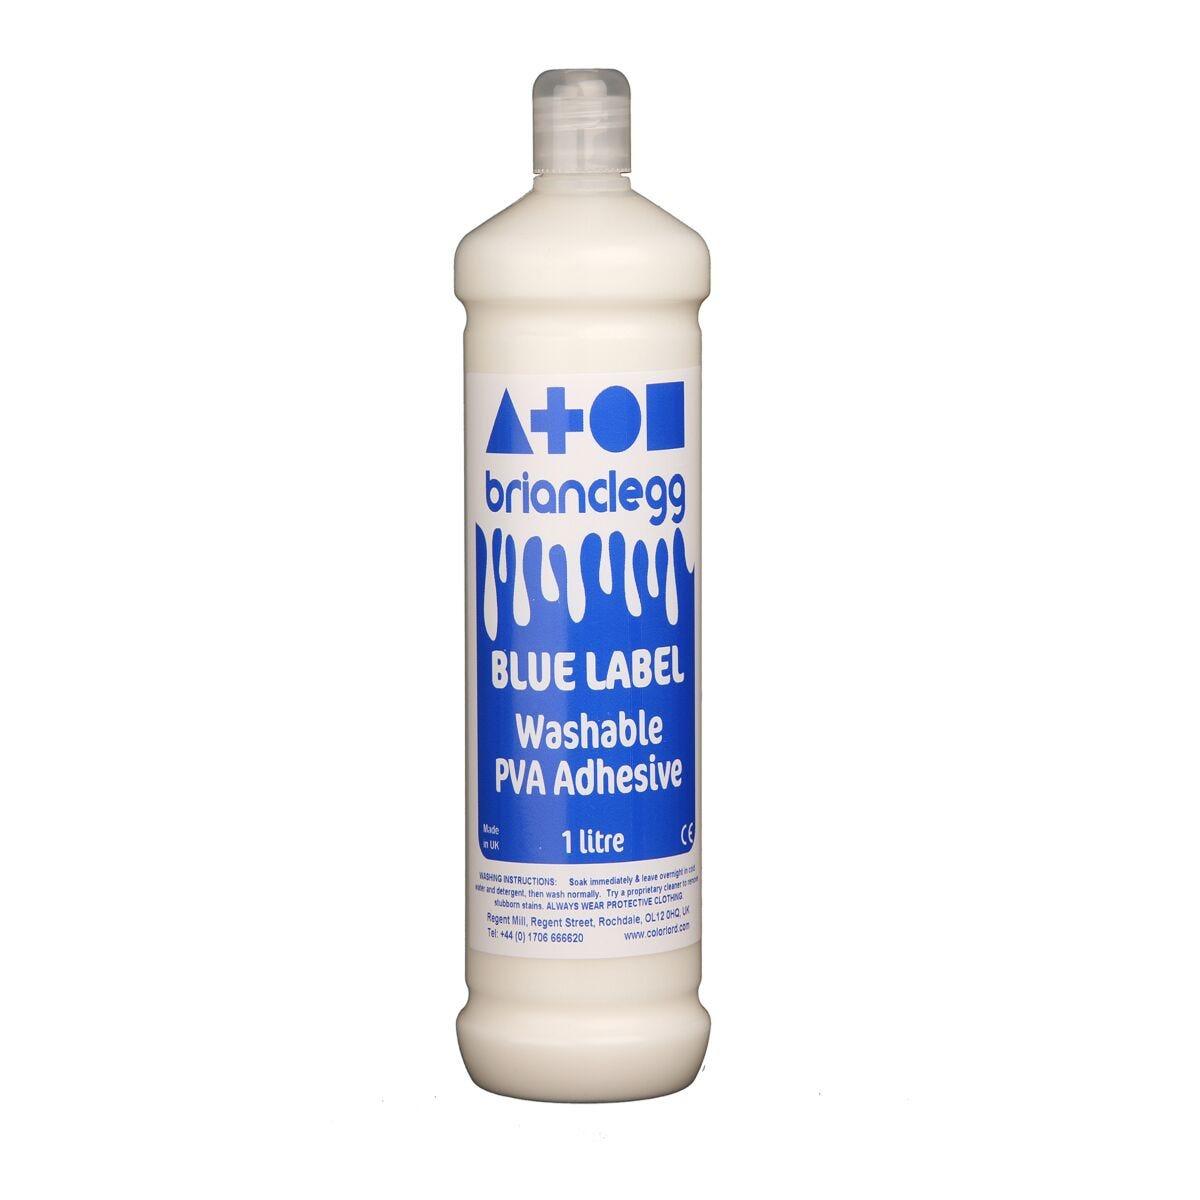 Blue Label Washable PVA Adhesive Glue 1L Bottle